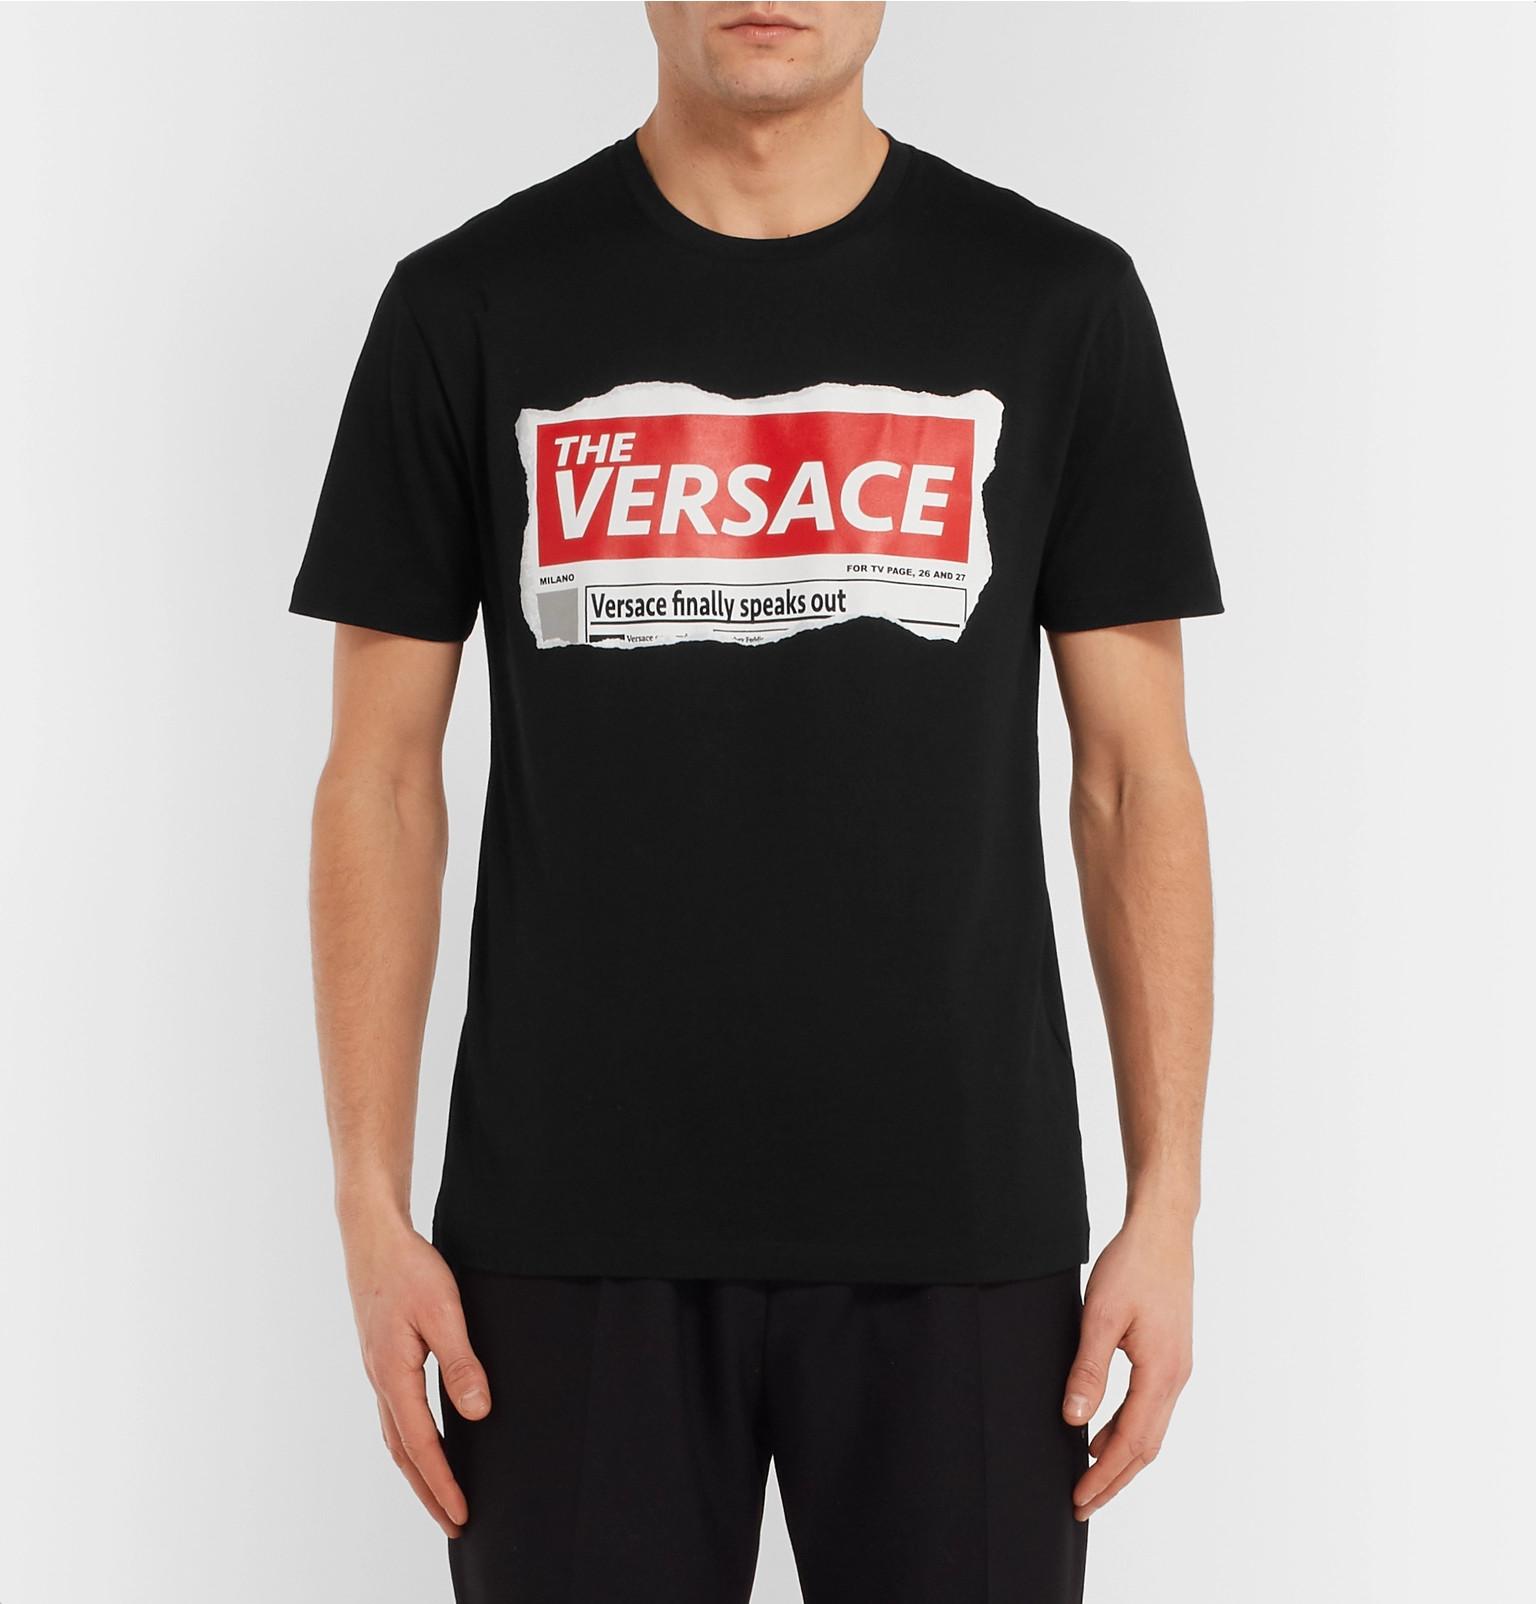 b7bcc2a6a Versace - Logo-Print Cotton-Jersey T-Shirt